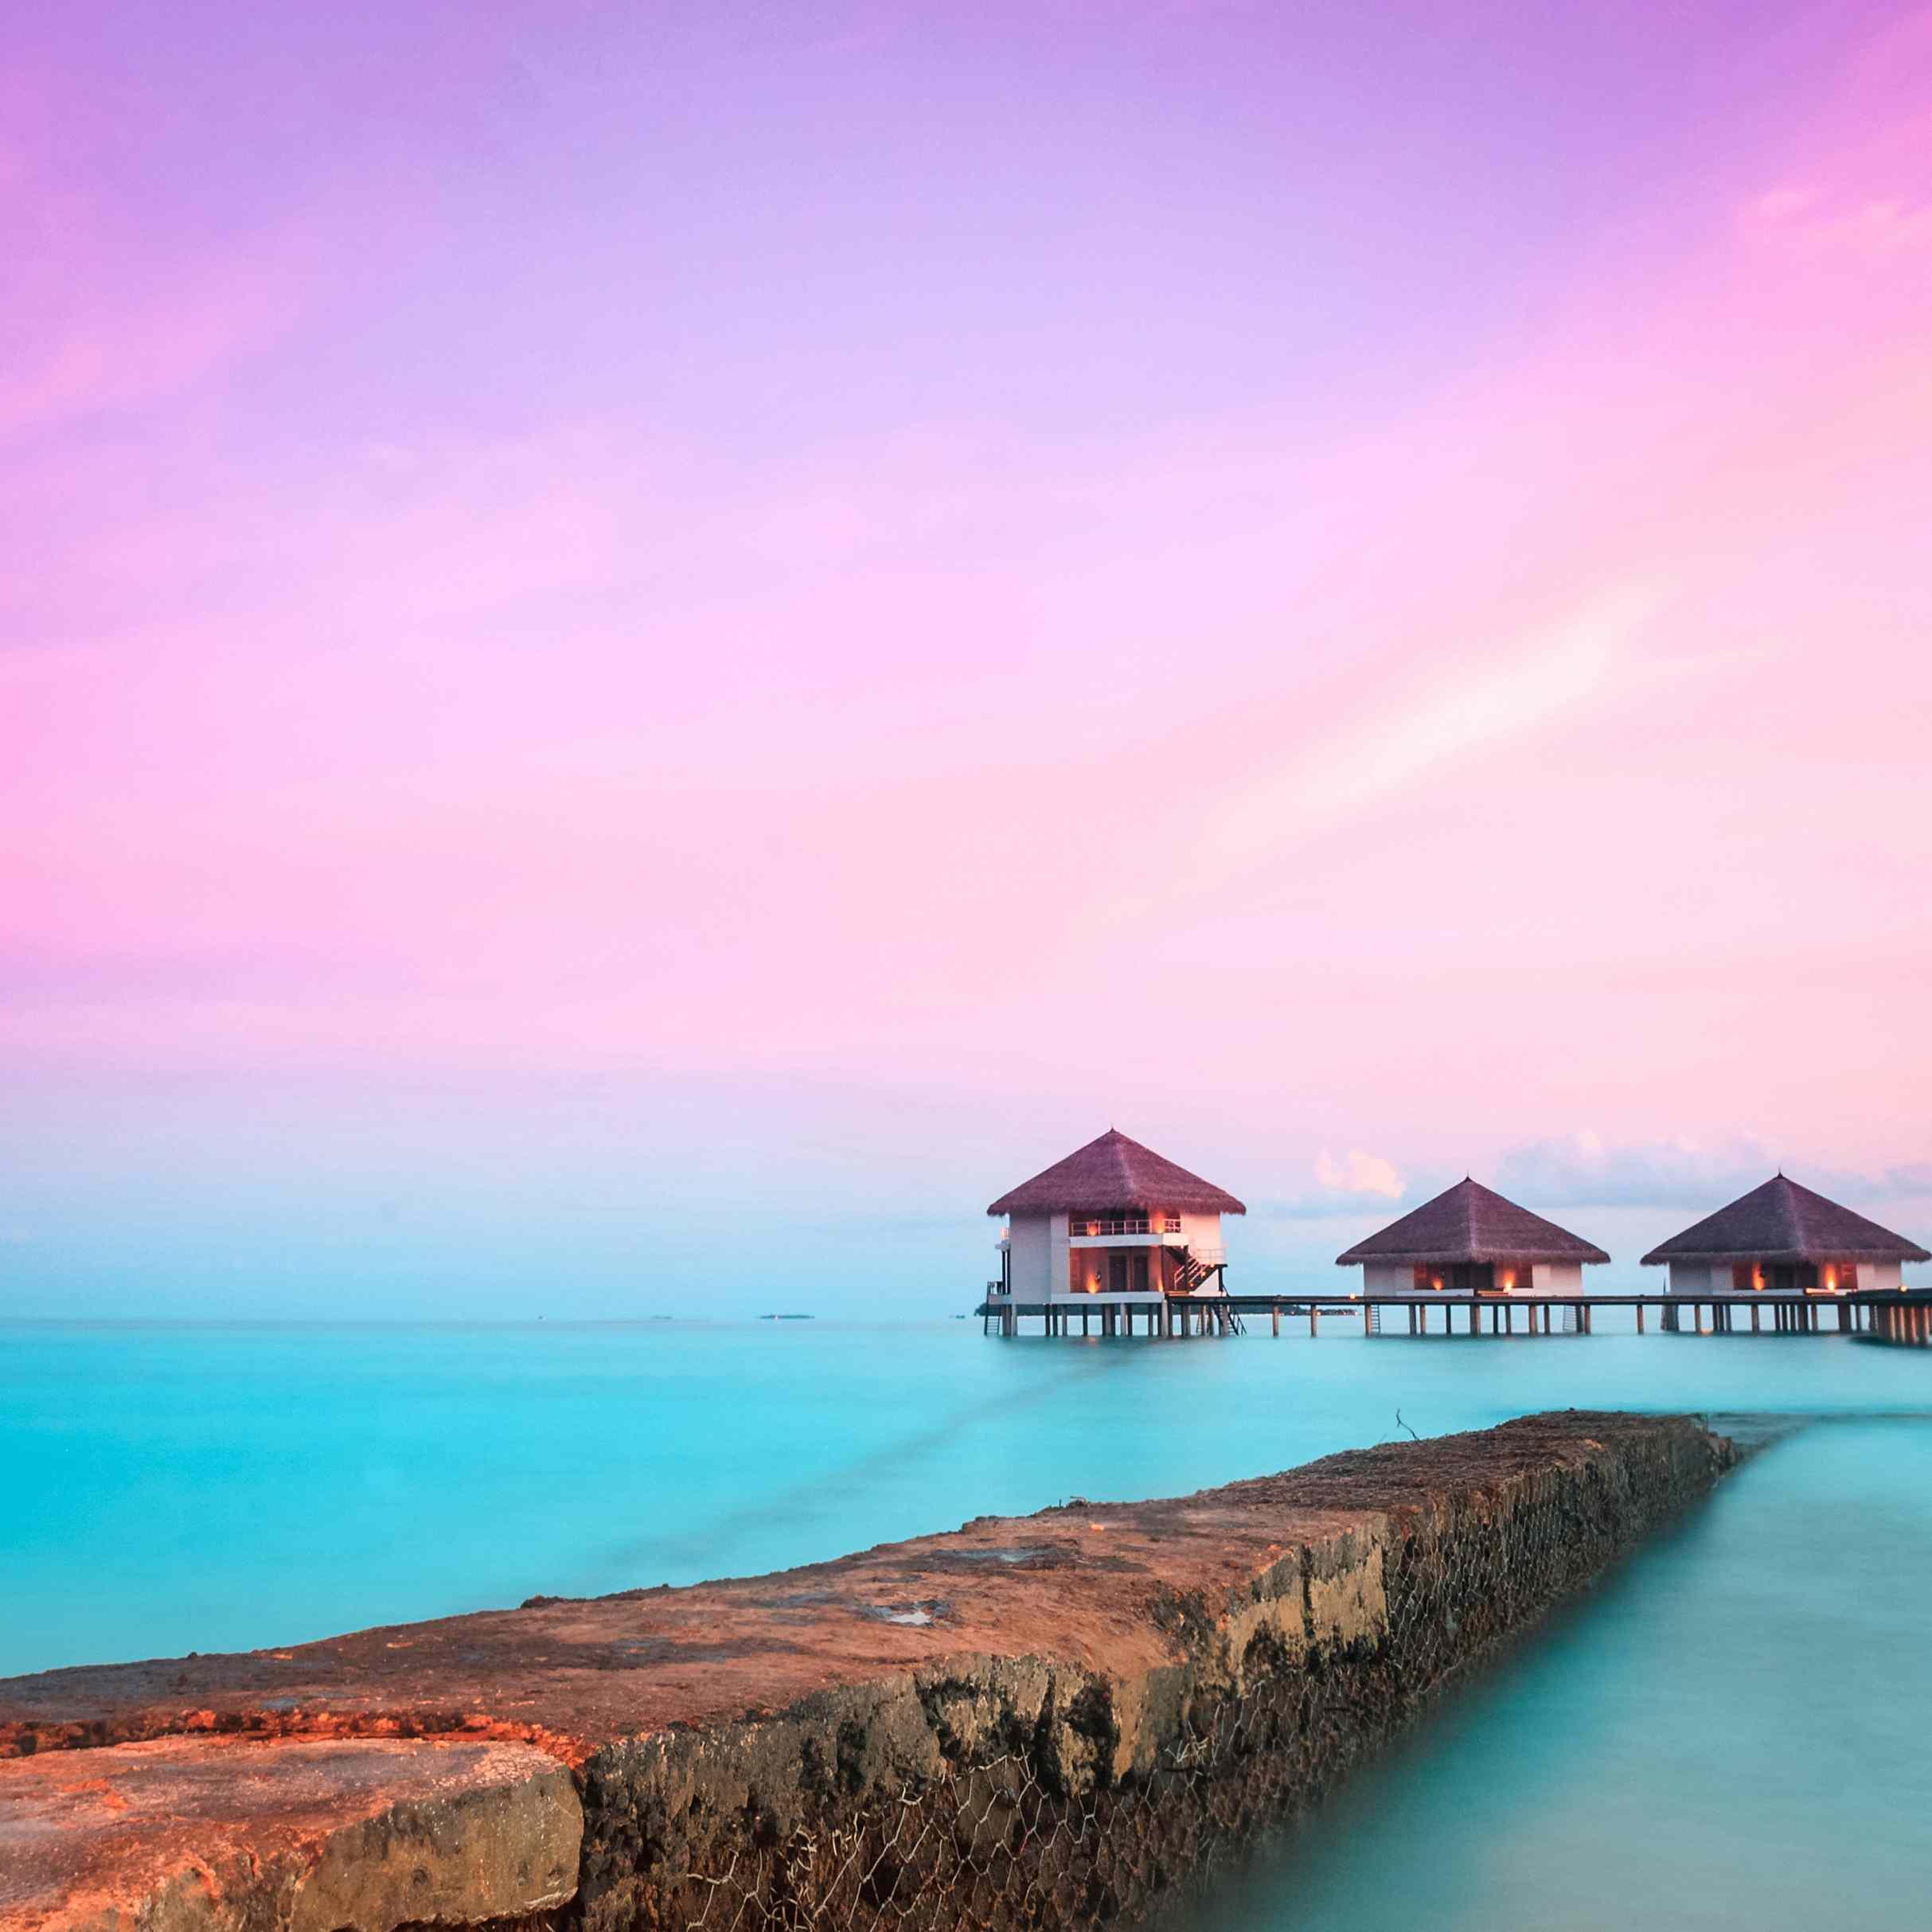 Where Is Bora Bora >> Bora Bora And Beyond A Guide To Romantic French Polynesia